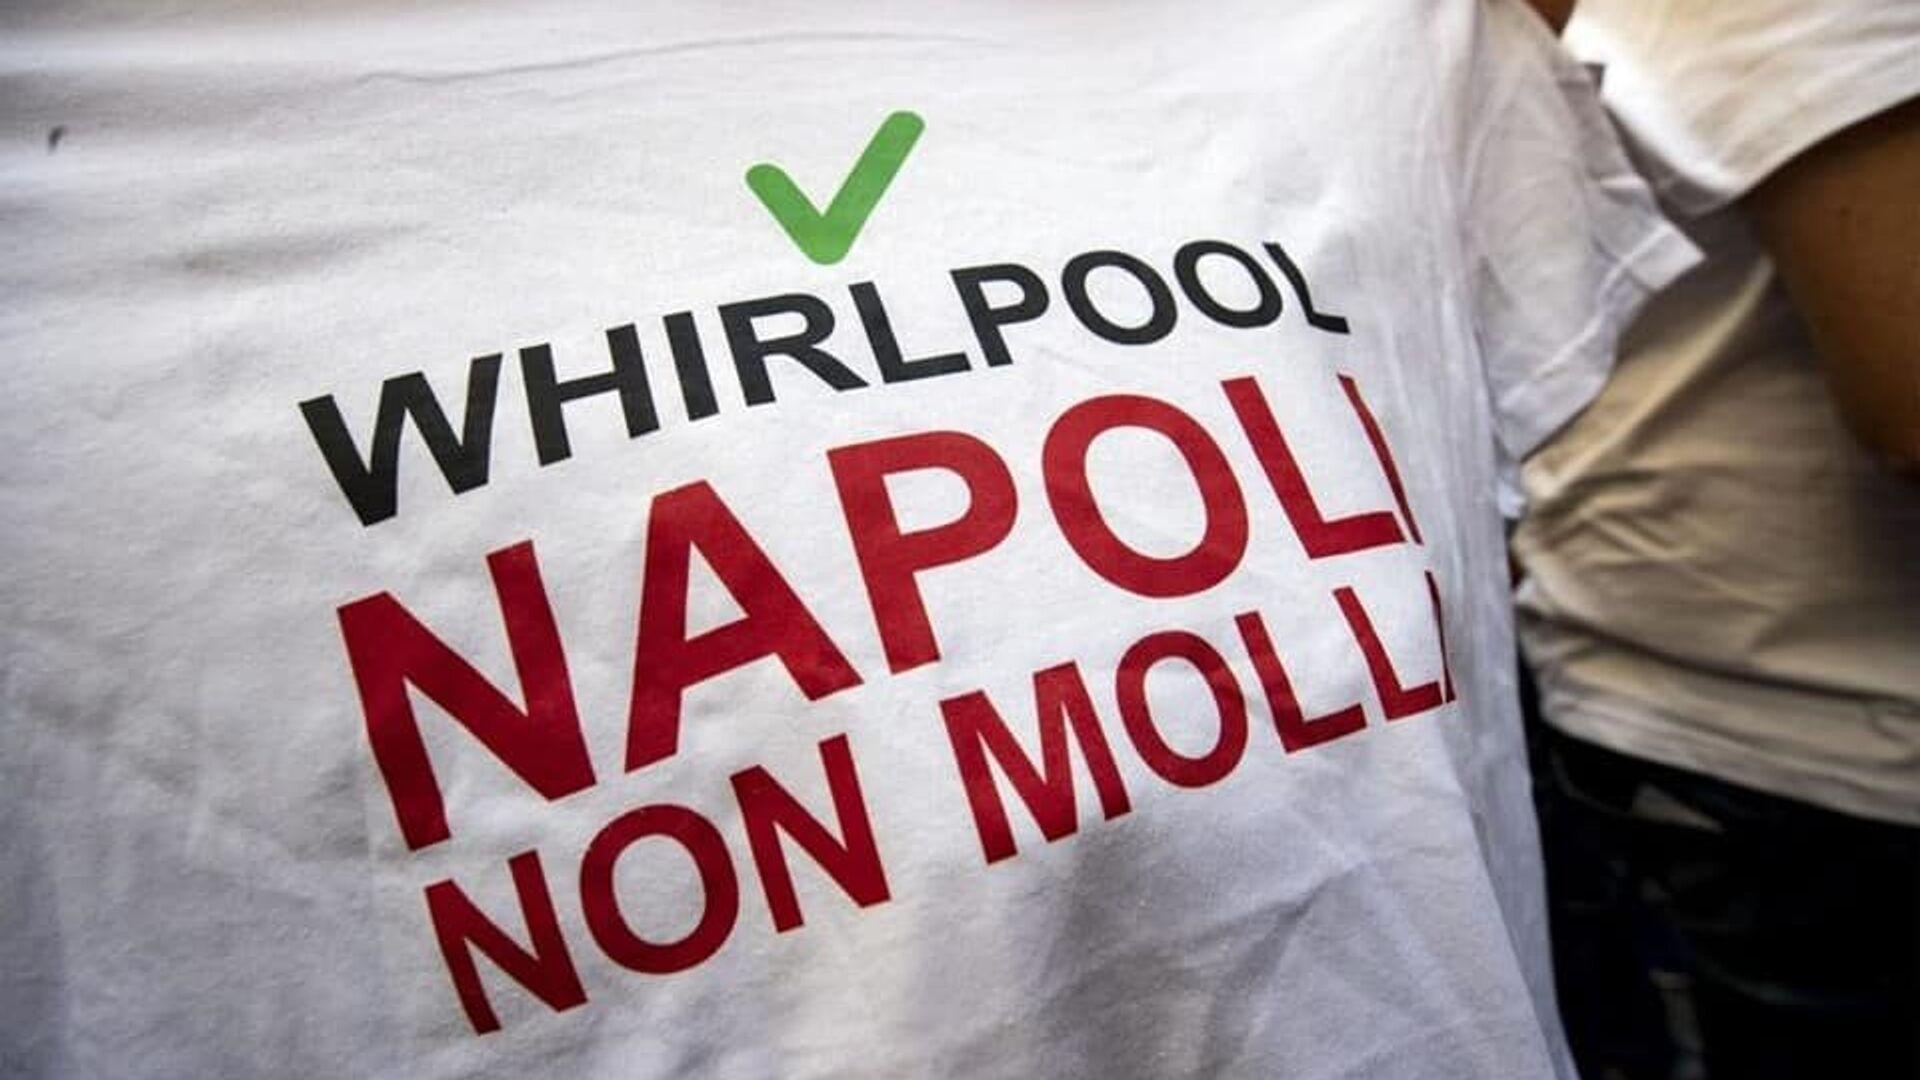 Vertenza Whirlpool, la protesta dei lavoratori - Sputnik Italia, 1920, 23.09.2021